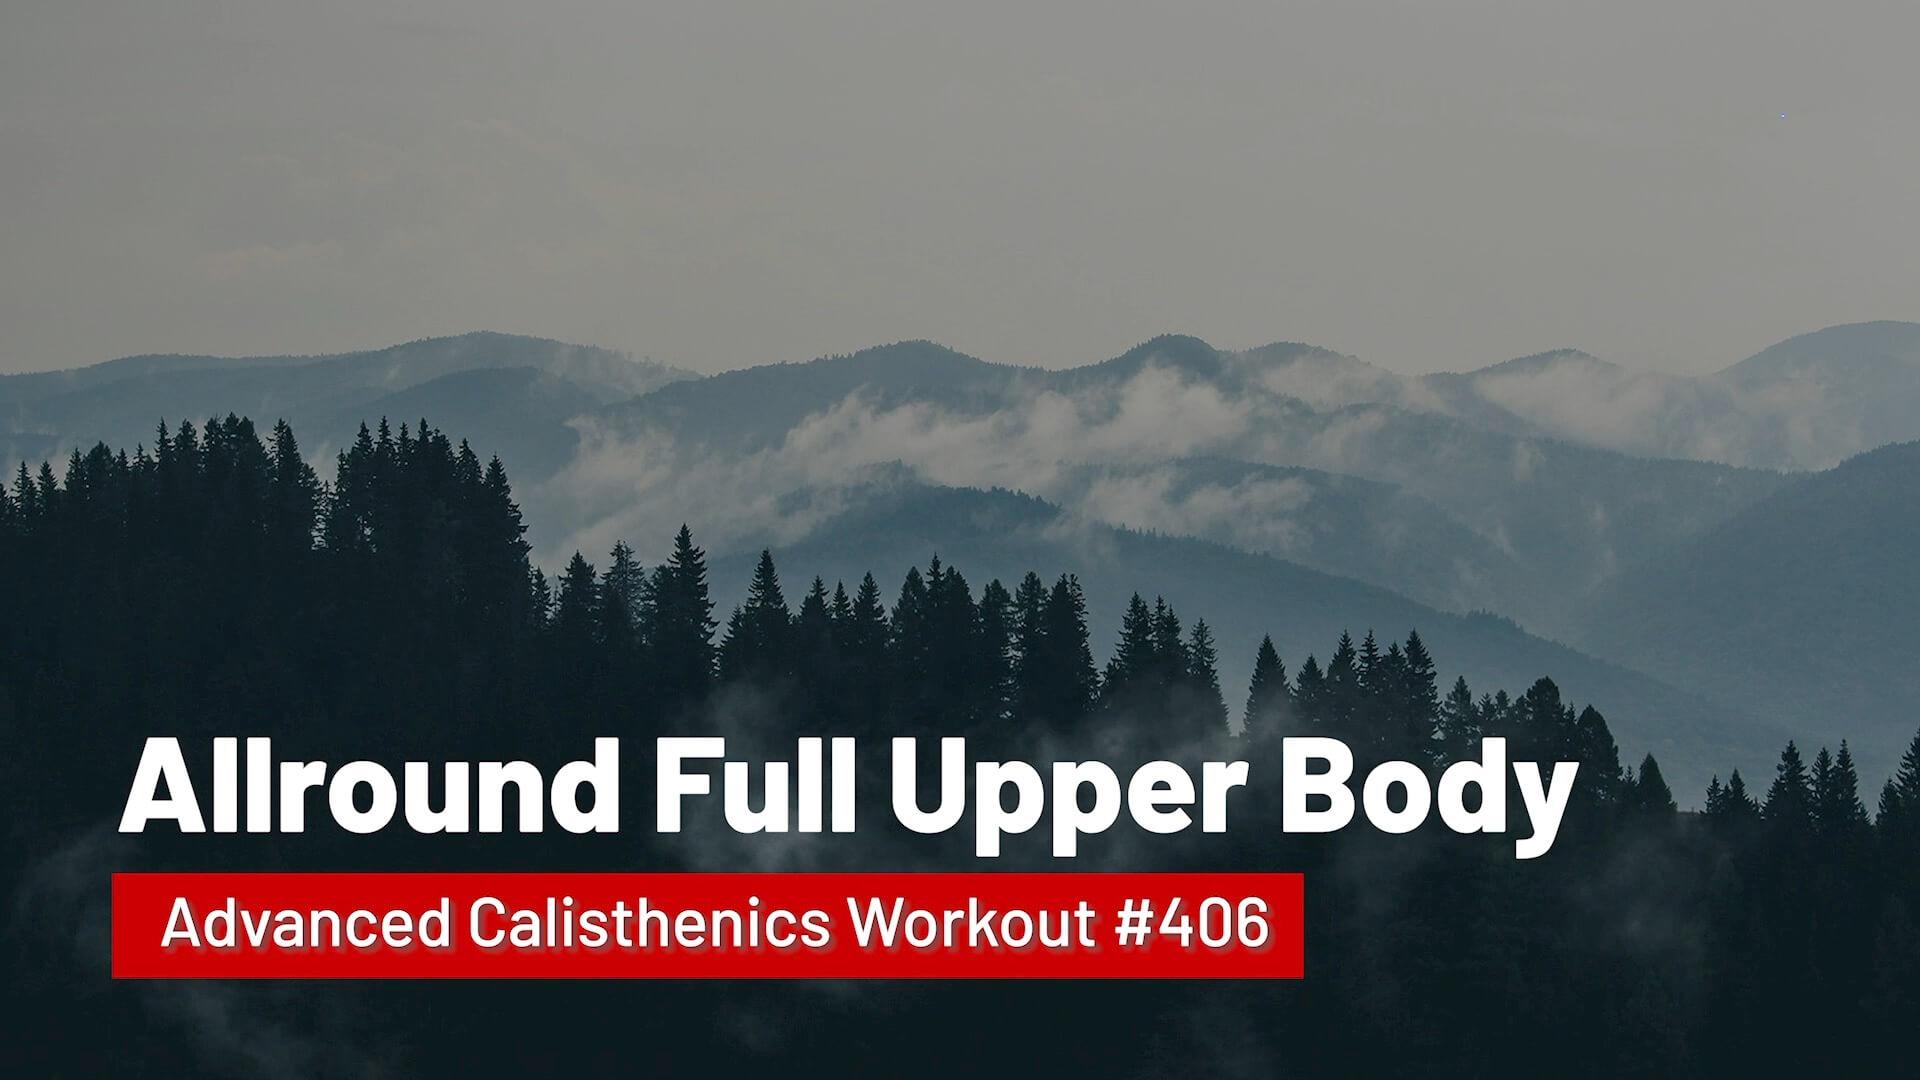 Workout #406